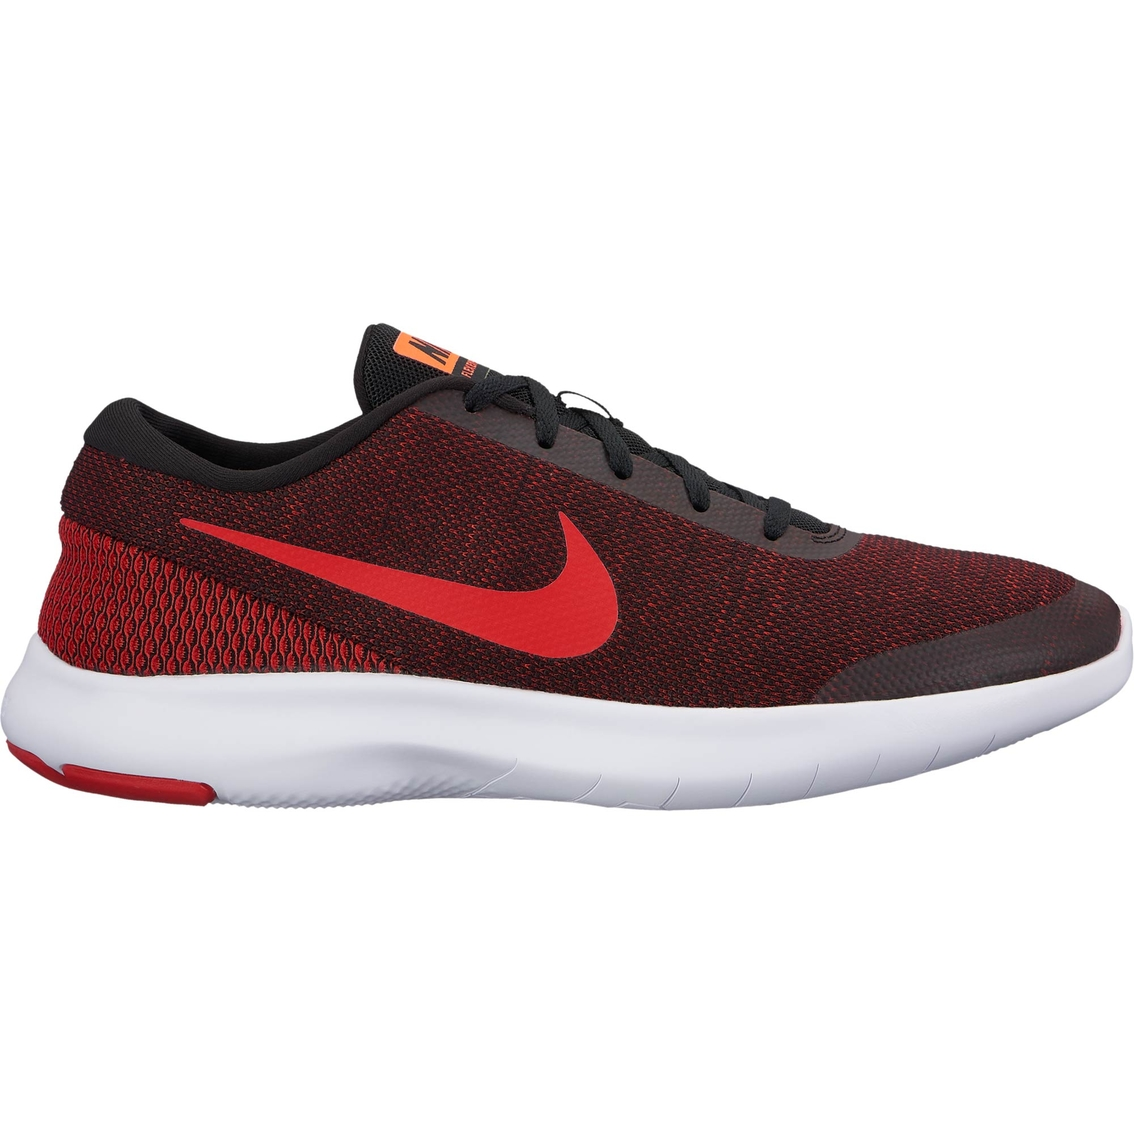 cf0144fc9aca Nike Men s Flex Experience Rn 7 Running Shoes